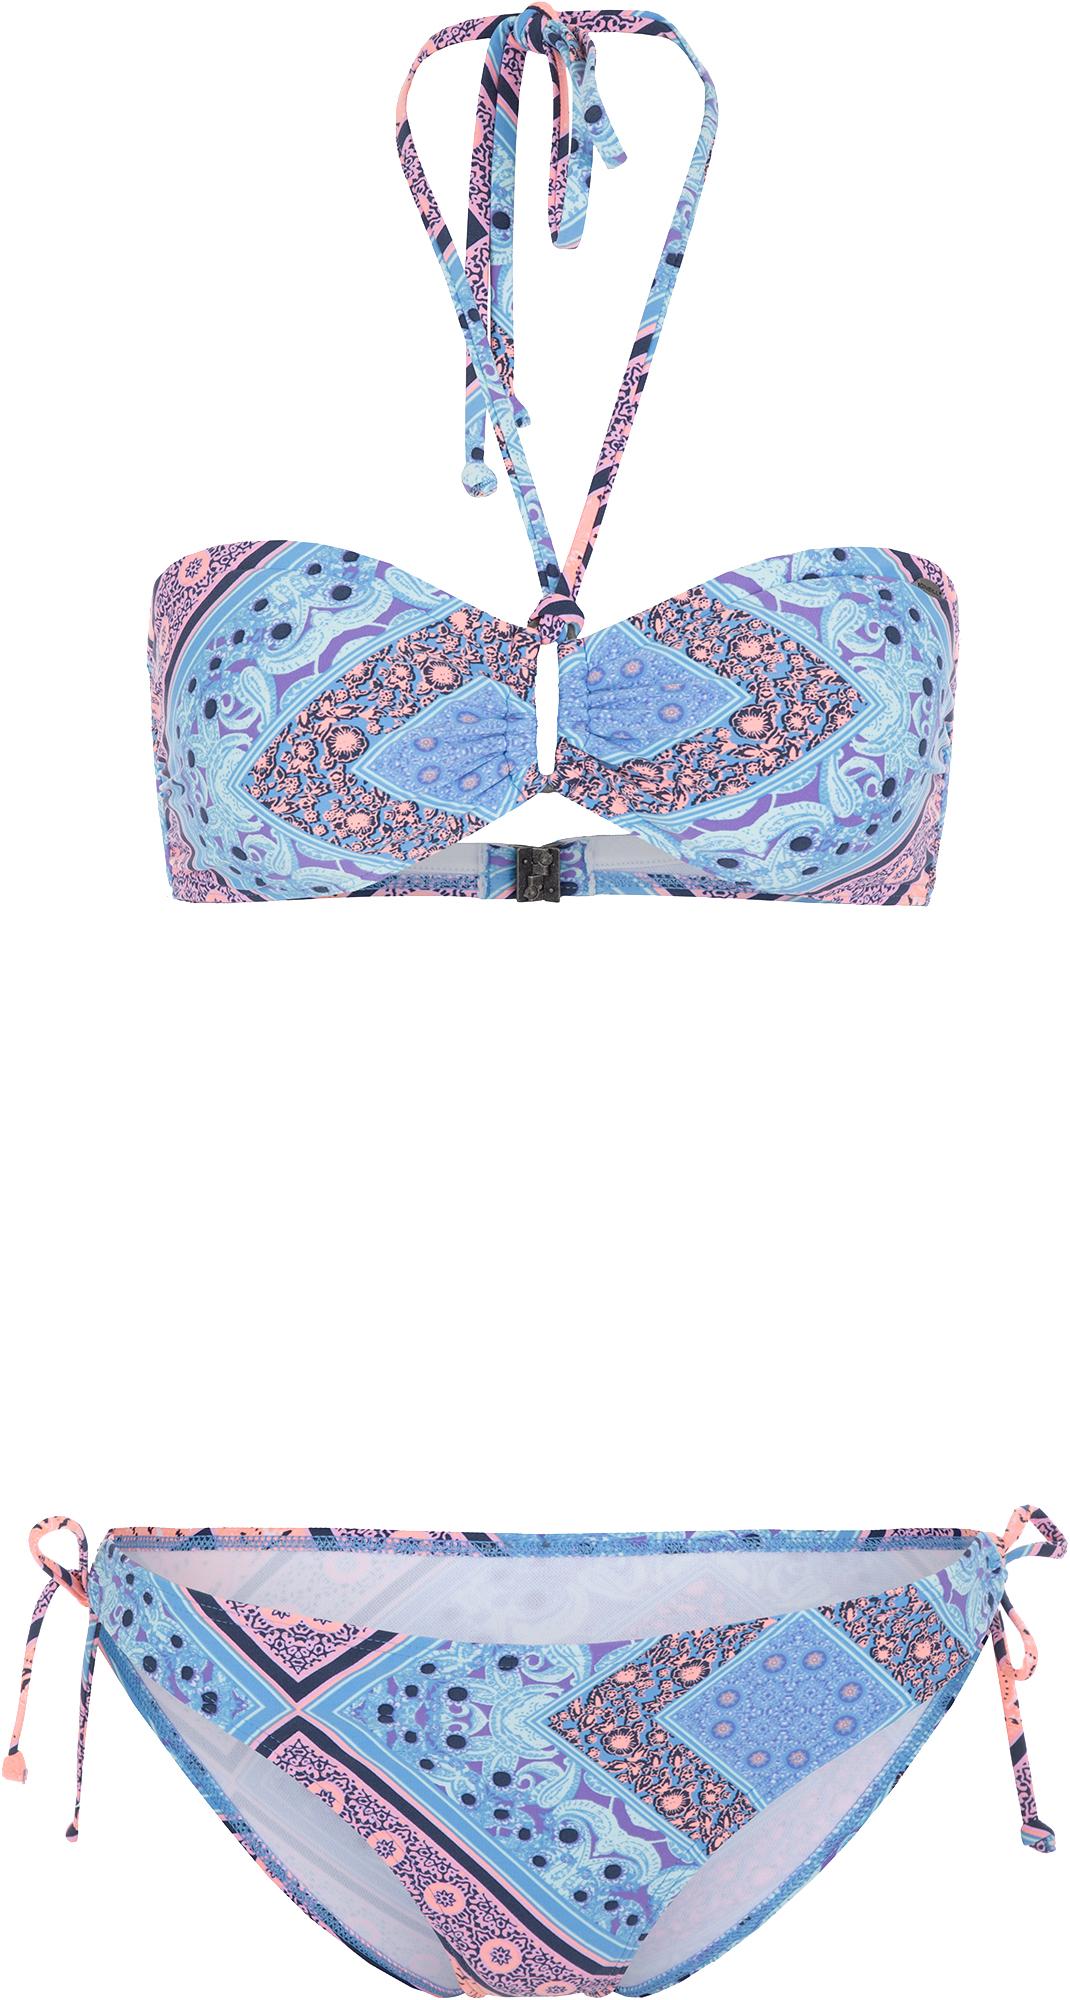 O'Neill Бикини женское O'Neill Pw Pulca Cruz Print, размер 42B женское бикини fyclothes 2015fashion m l xl bk099